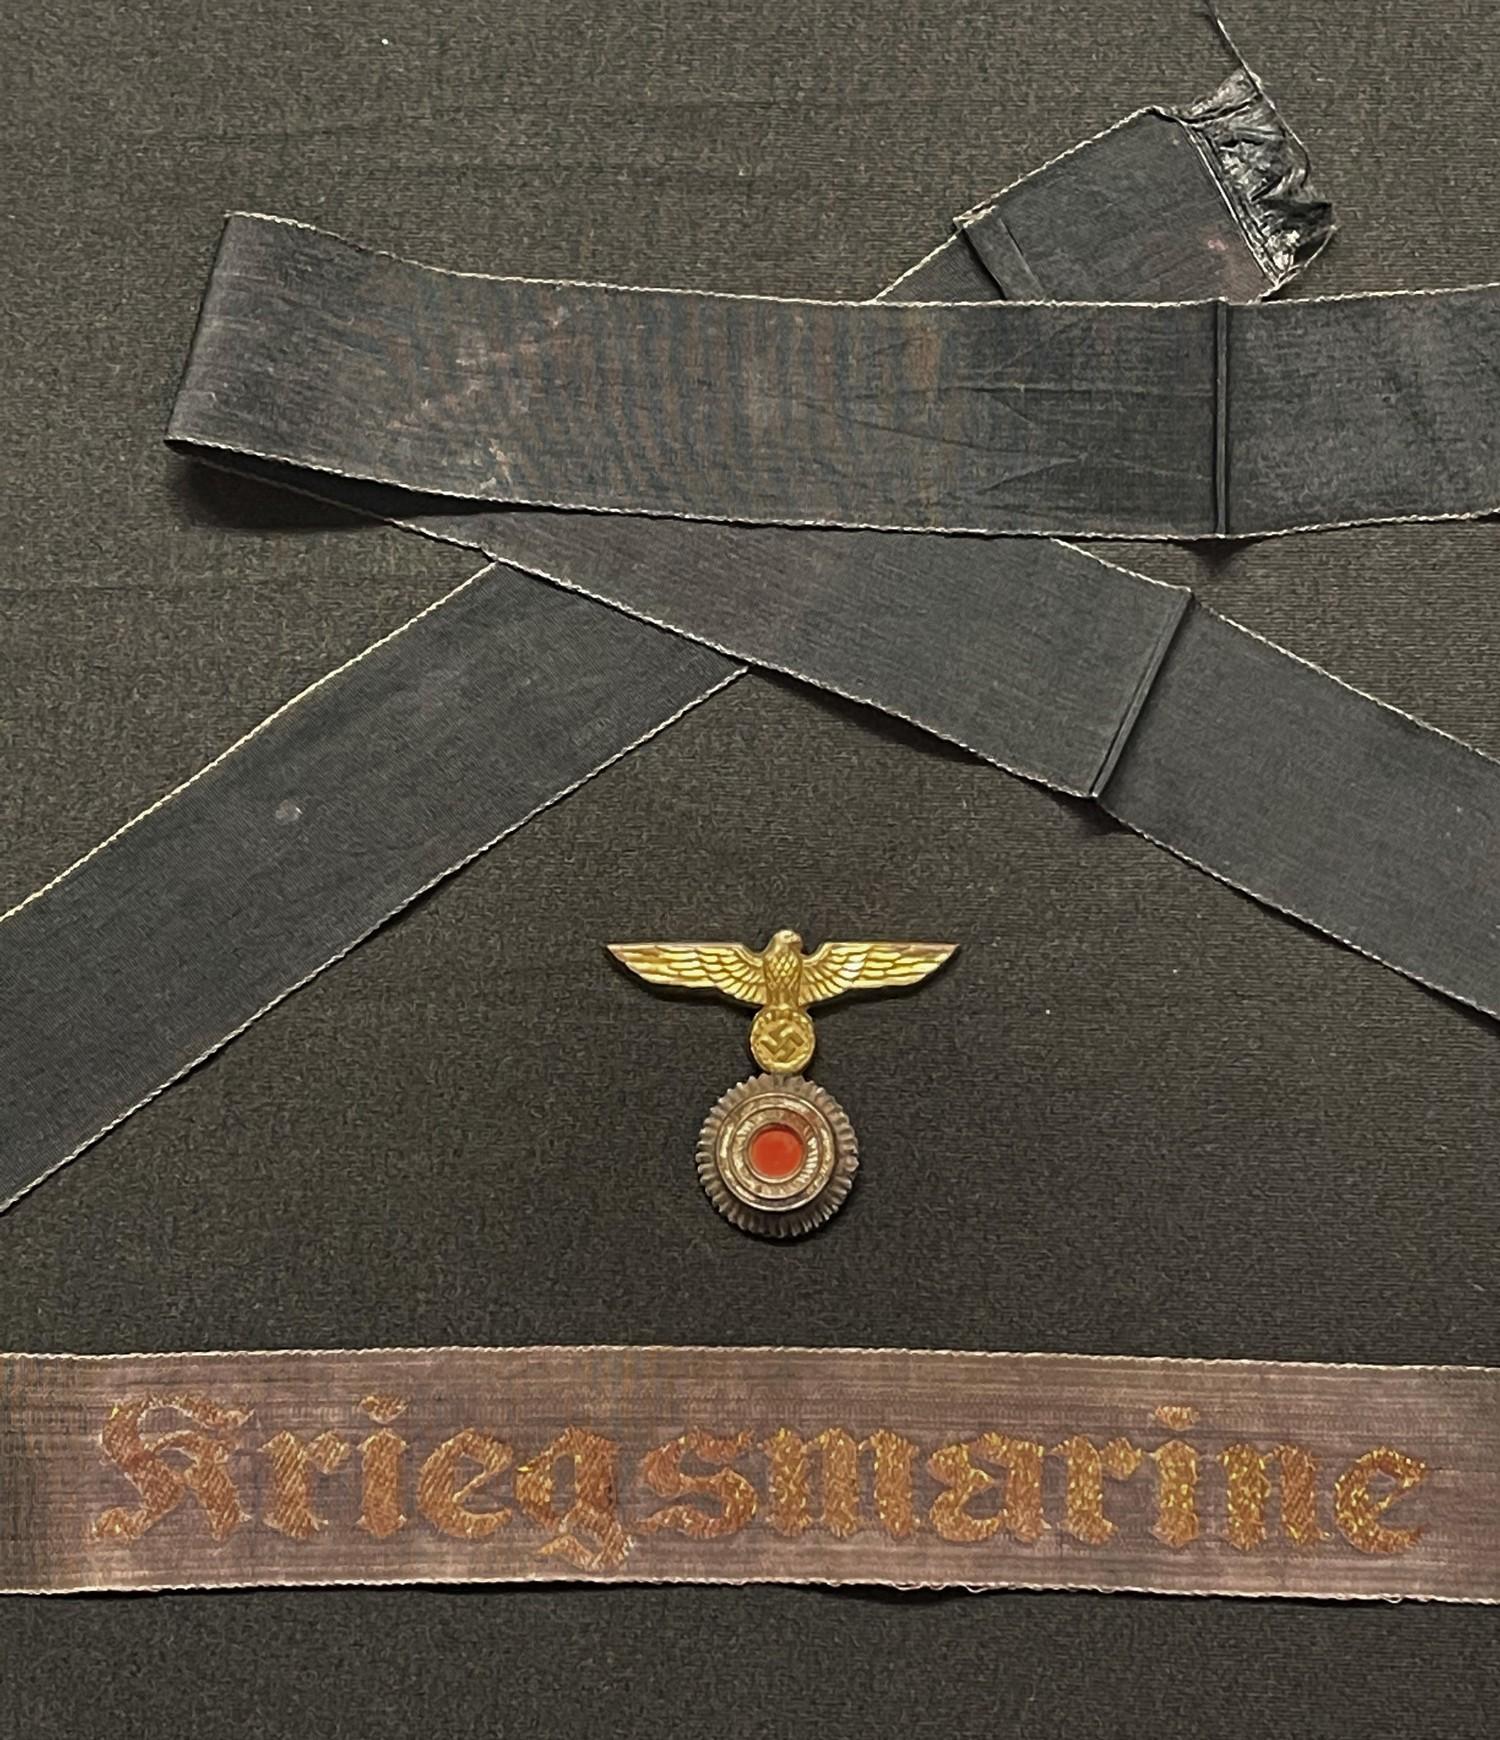 WW2 Third Reich Kriegsmarine cap tally in wire thread, overall length 139cm, has been worn on a cap,